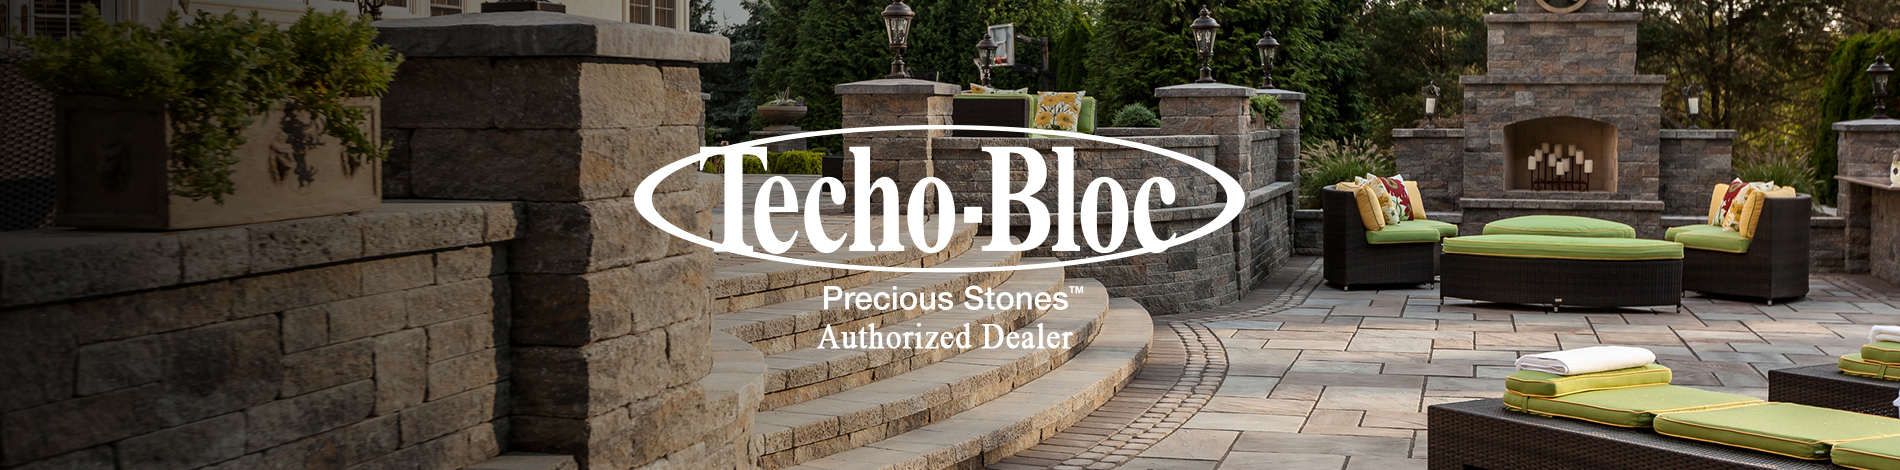 Techo Bloc Authorized Dealer Omaha Midwest